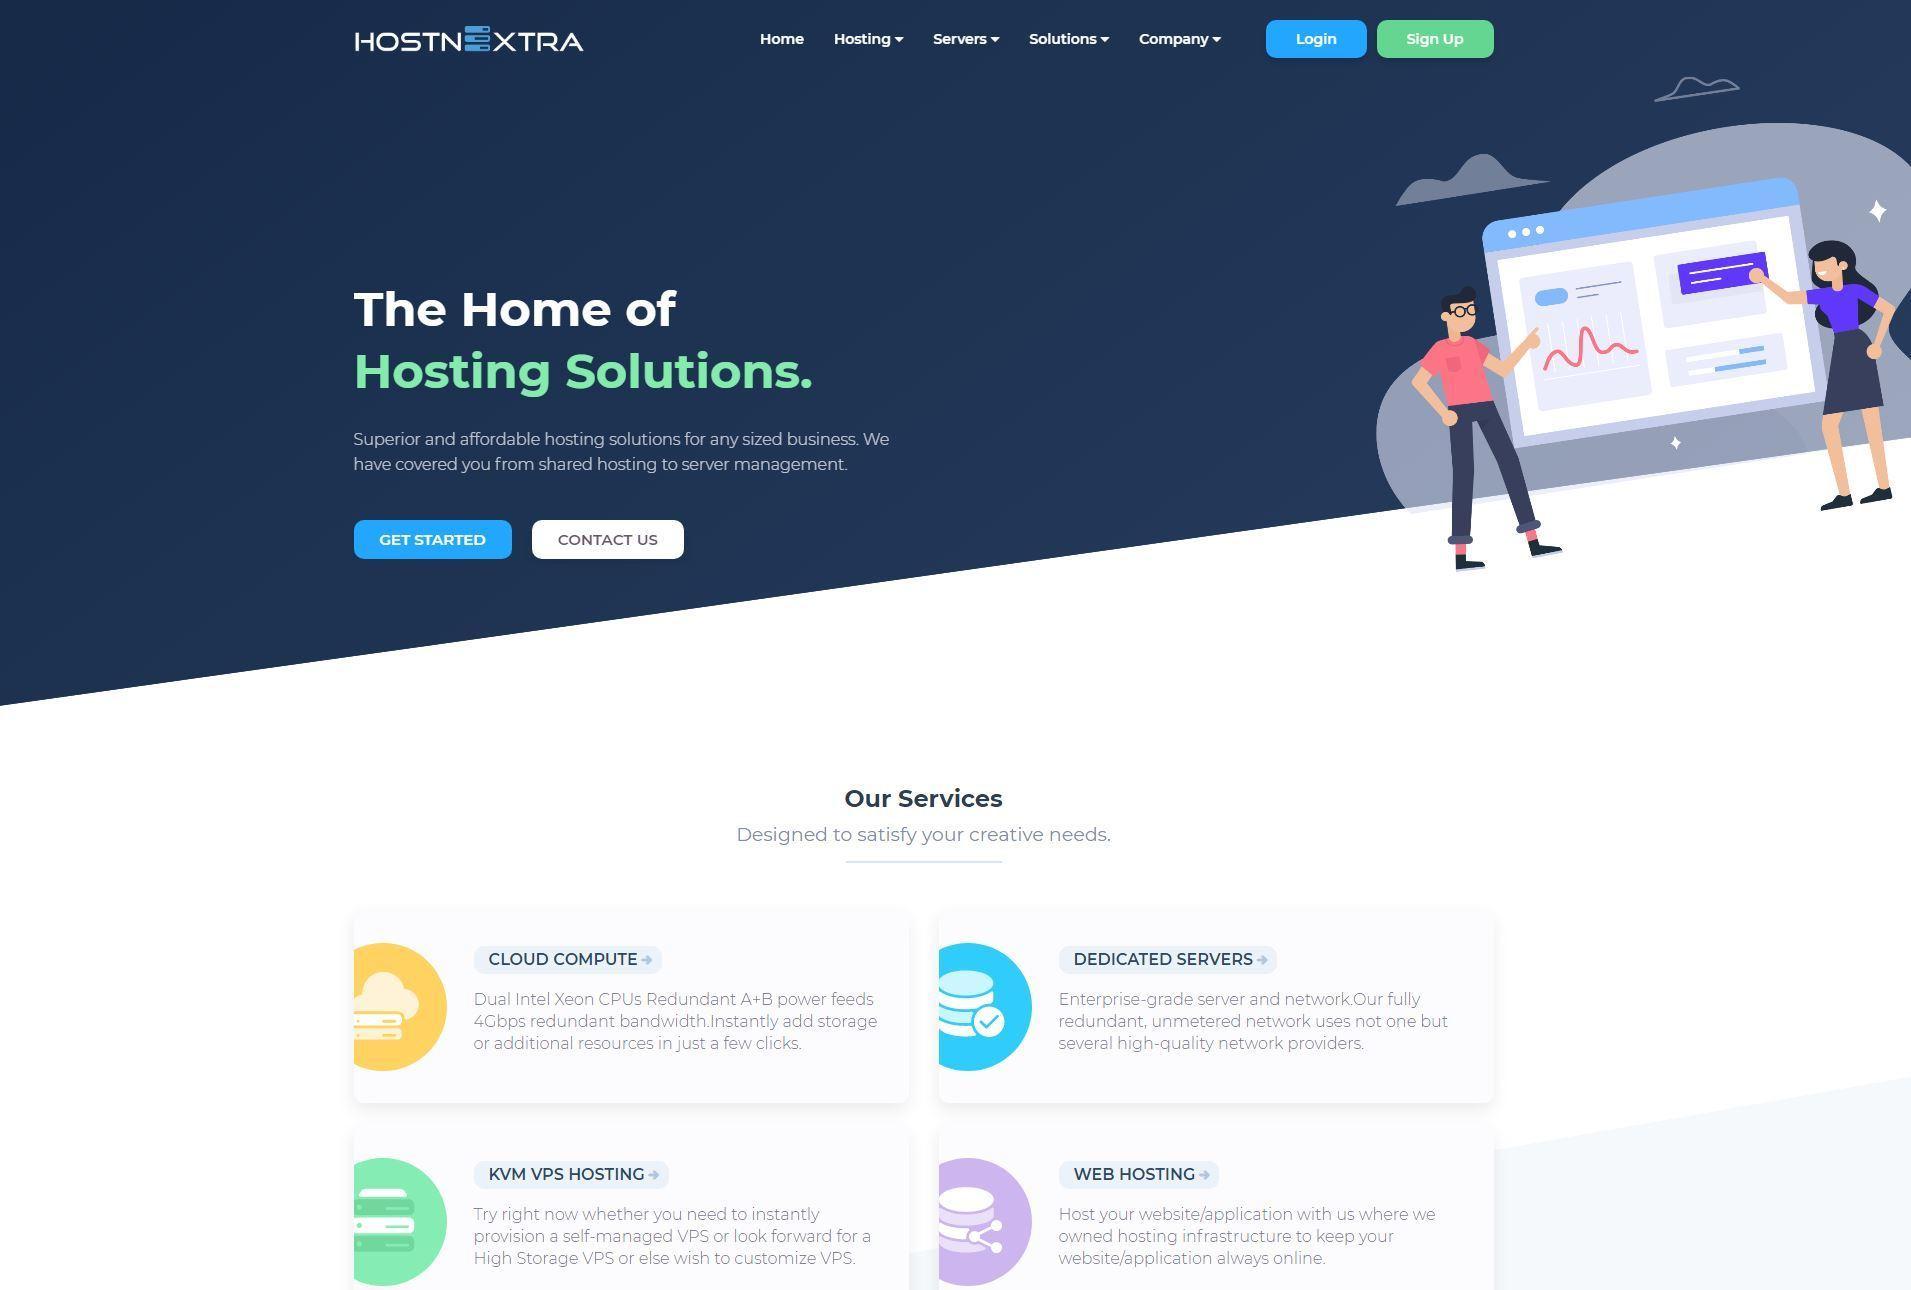 HostnExtra - Cheap VPS Hosting in Dallas, Texas